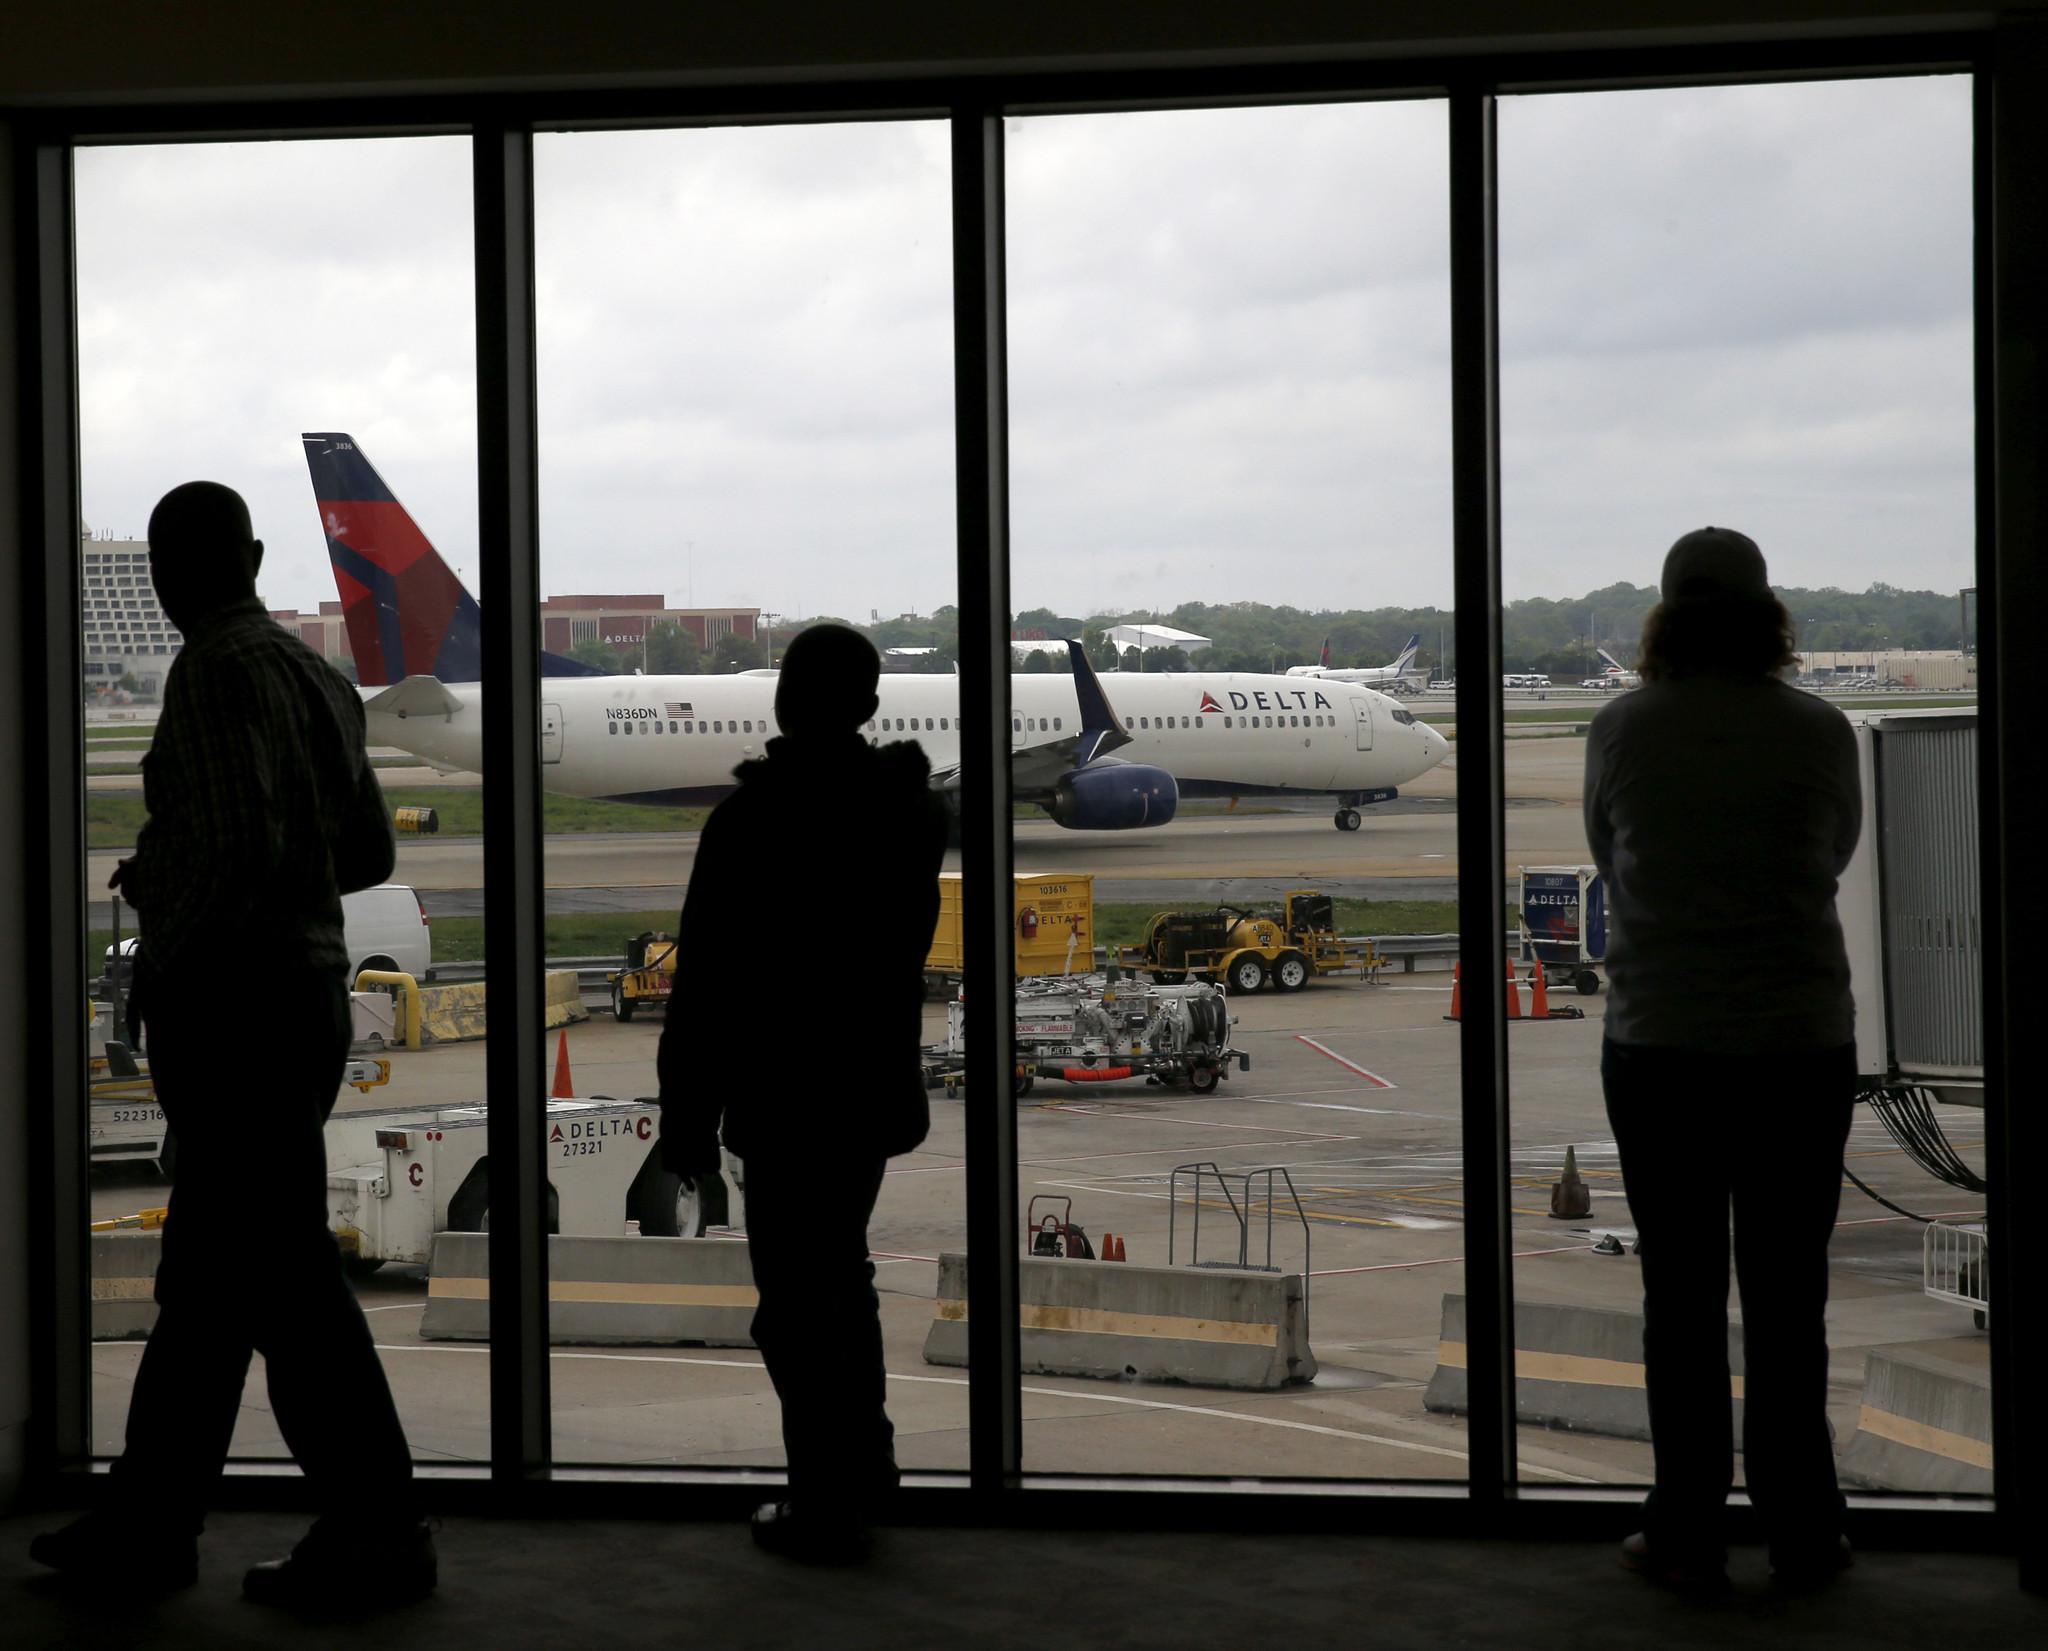 Enjoy your cheap summer airfares — you'll pay more next year